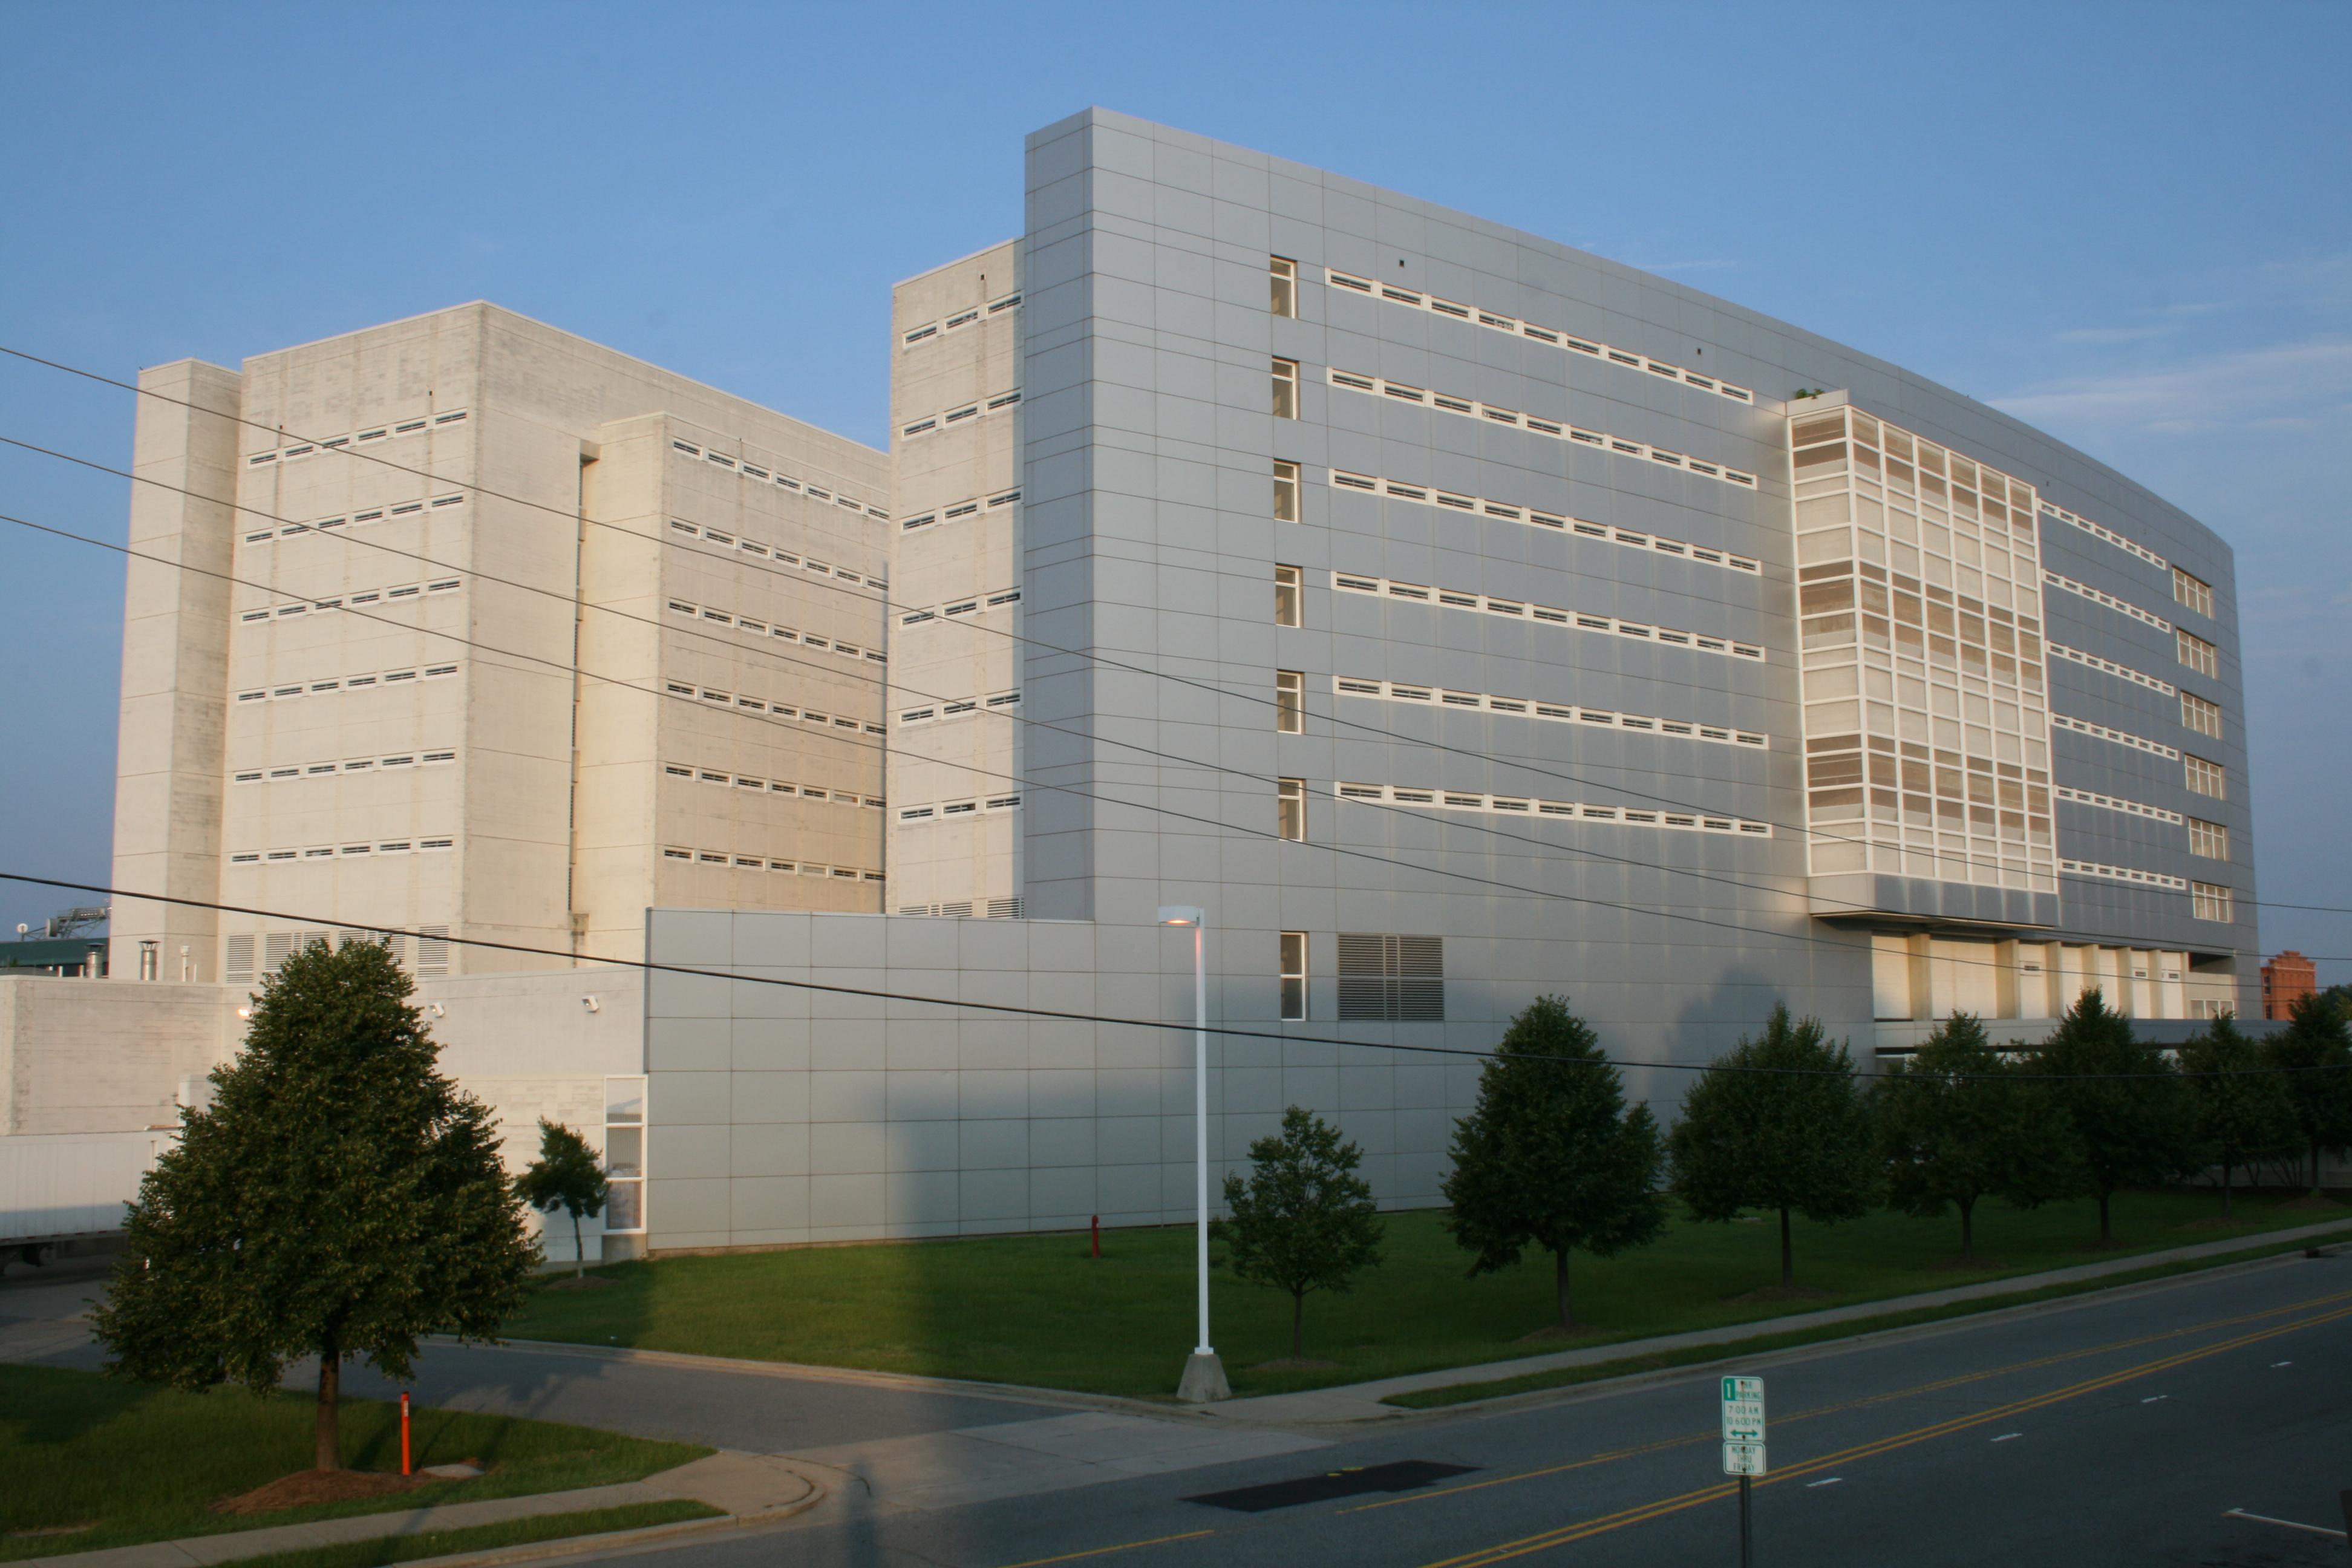 South Miami Building Department